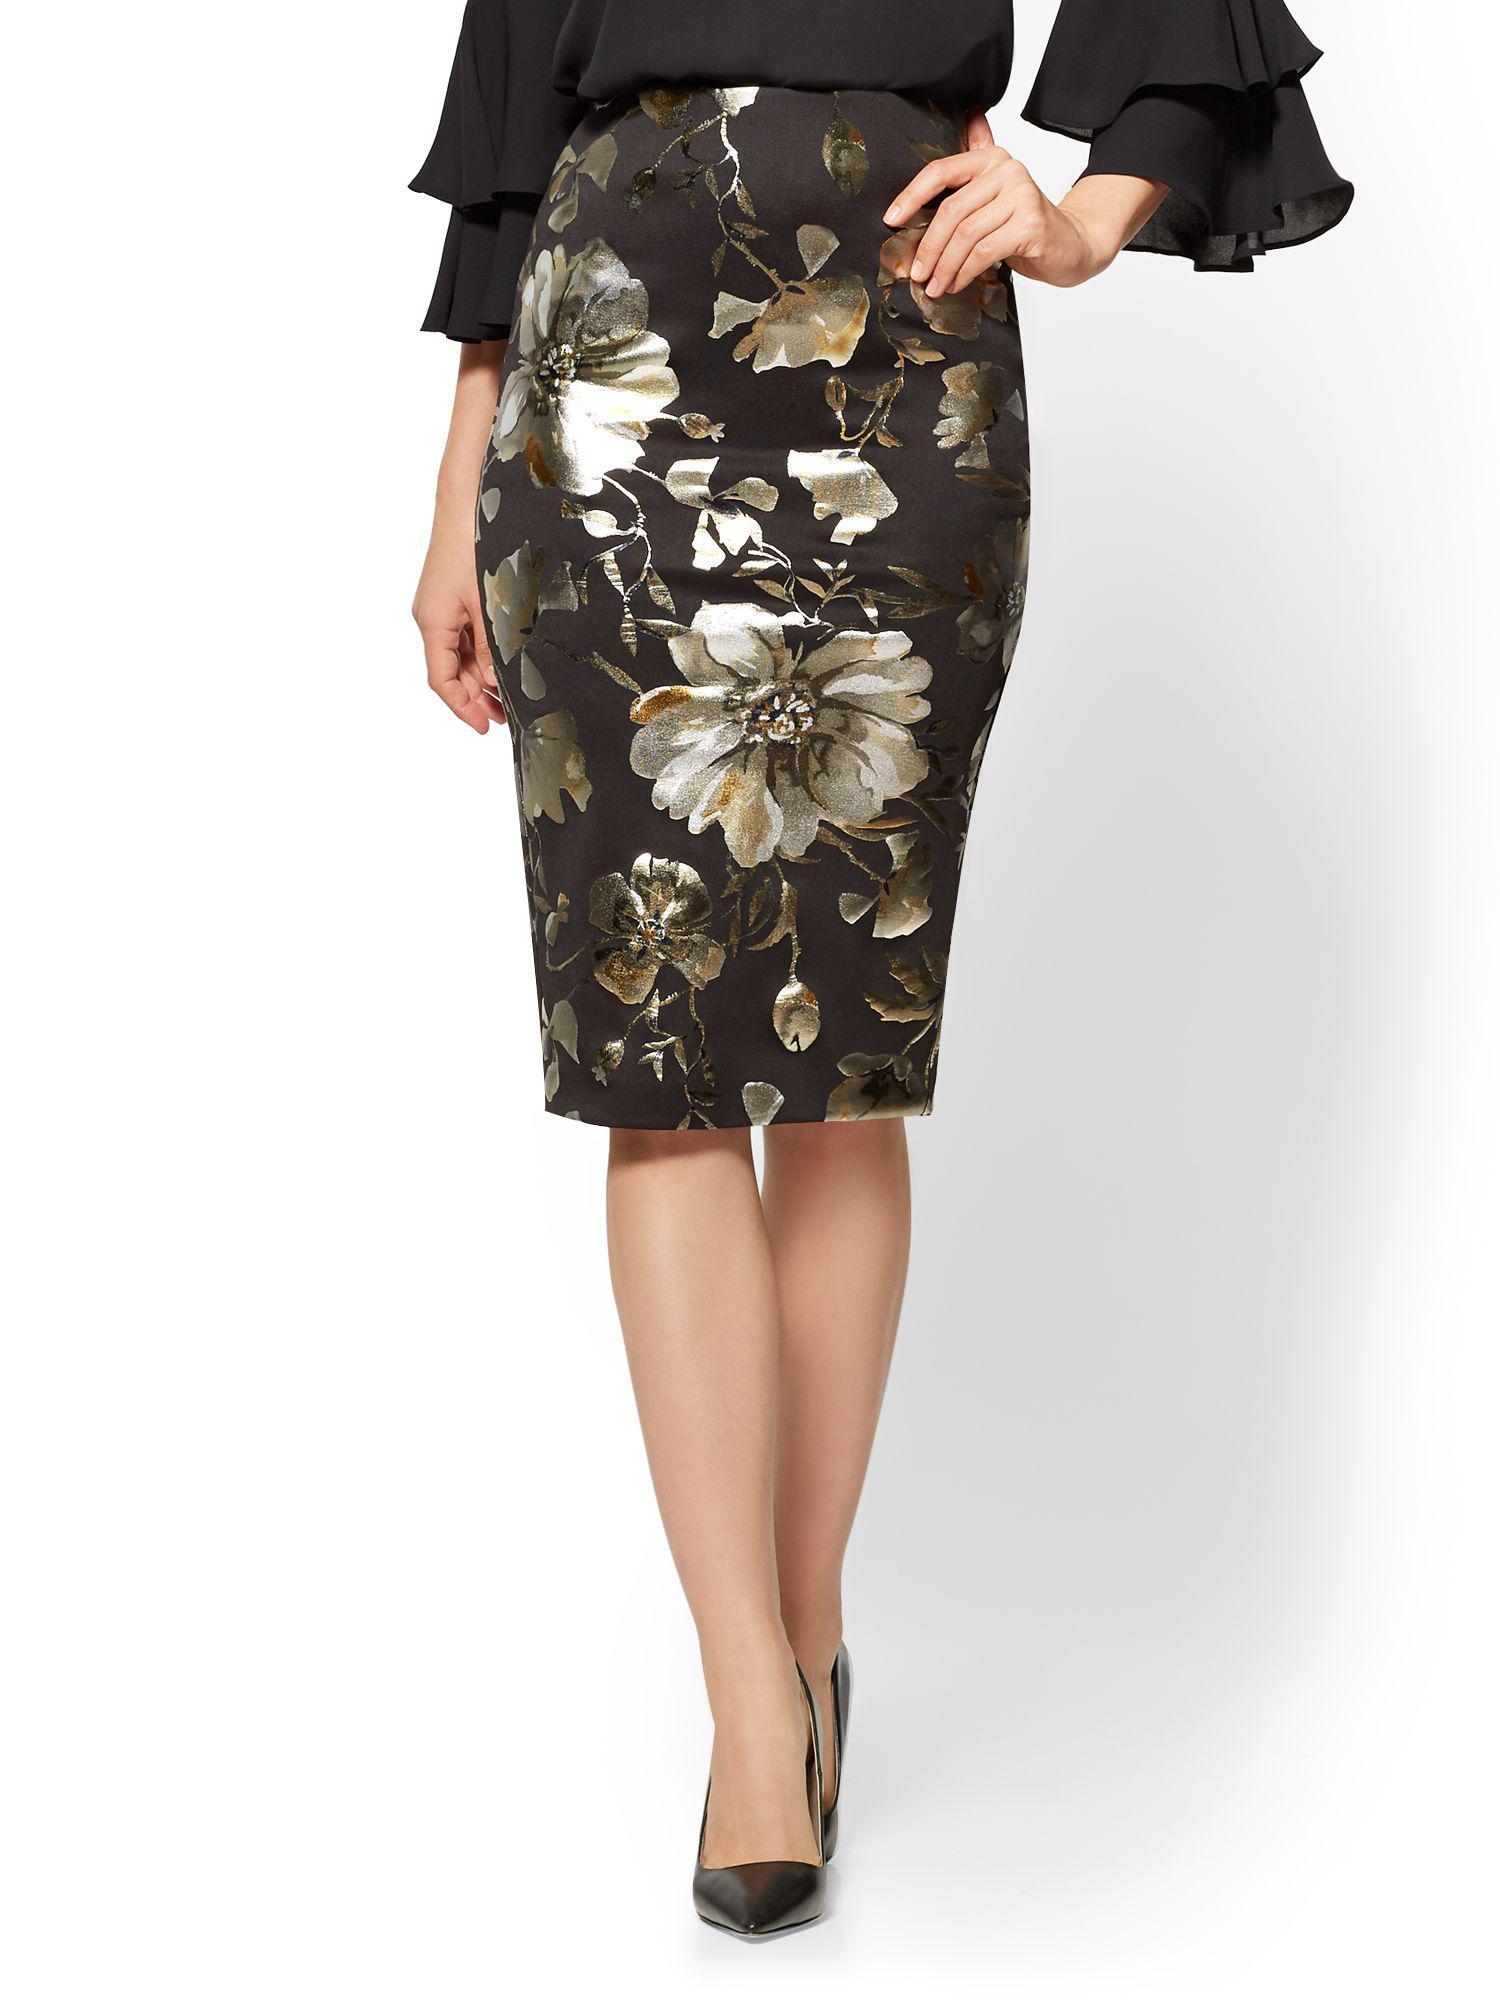 5531e2f5b52 Lyst - New York   Company Pull-on Pencil Skirt - Metallic-foil ...